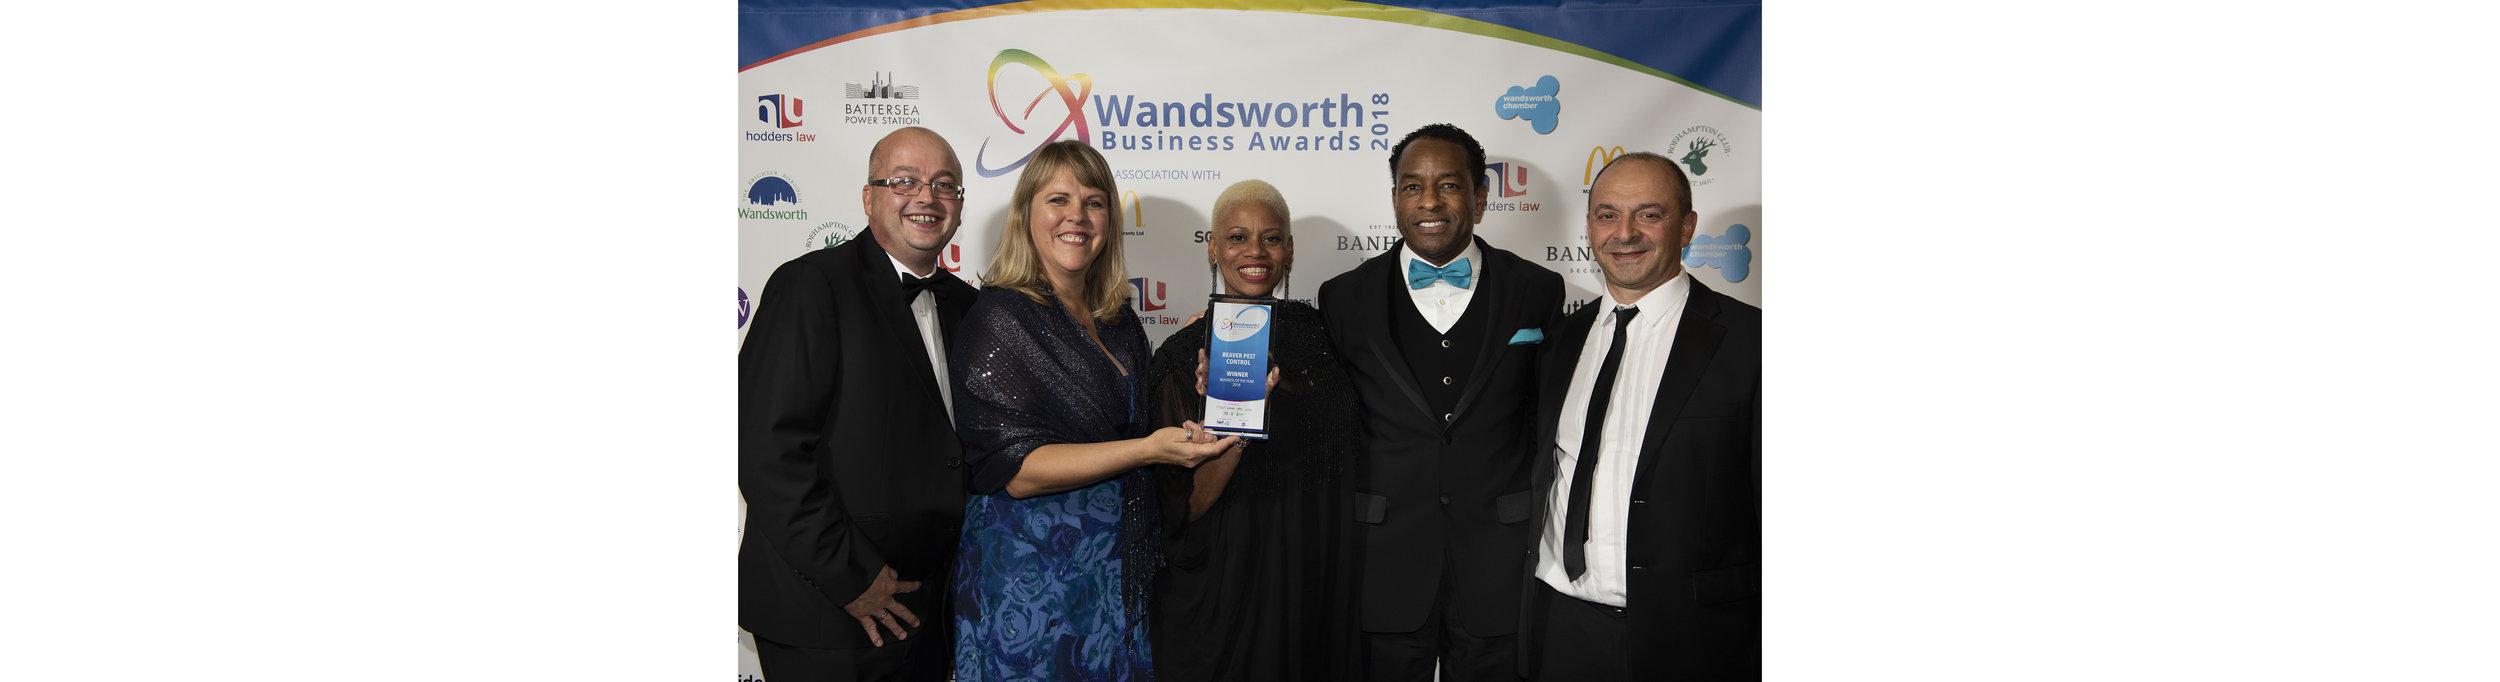 WANDSWORTH-WINNERS-2018_013 Biz of the Year.jpg